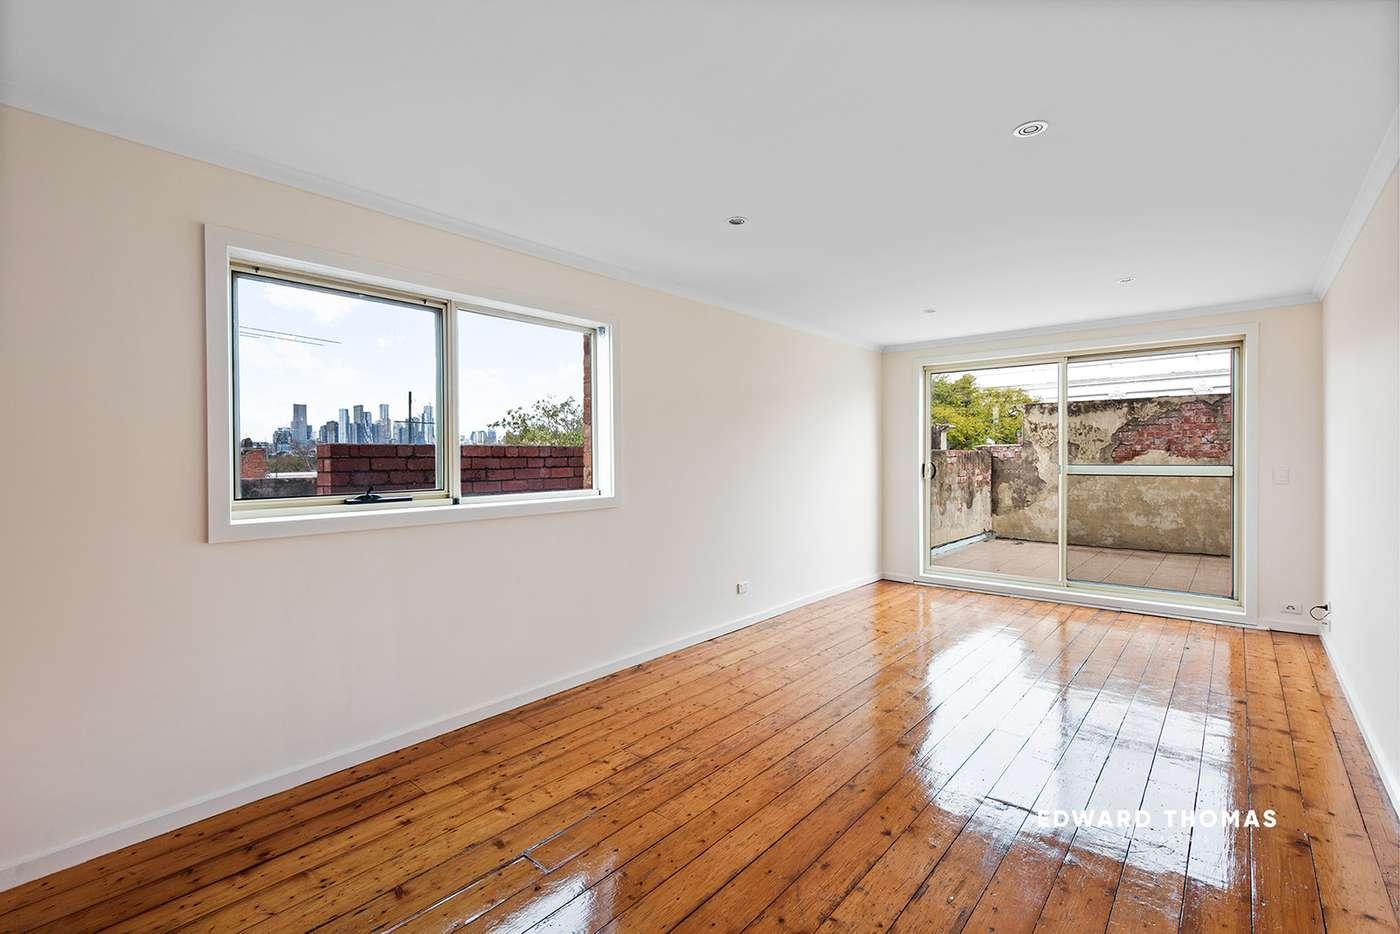 Main view of Homely apartment listing, 516A Macaulay Road, Kensington VIC 3031